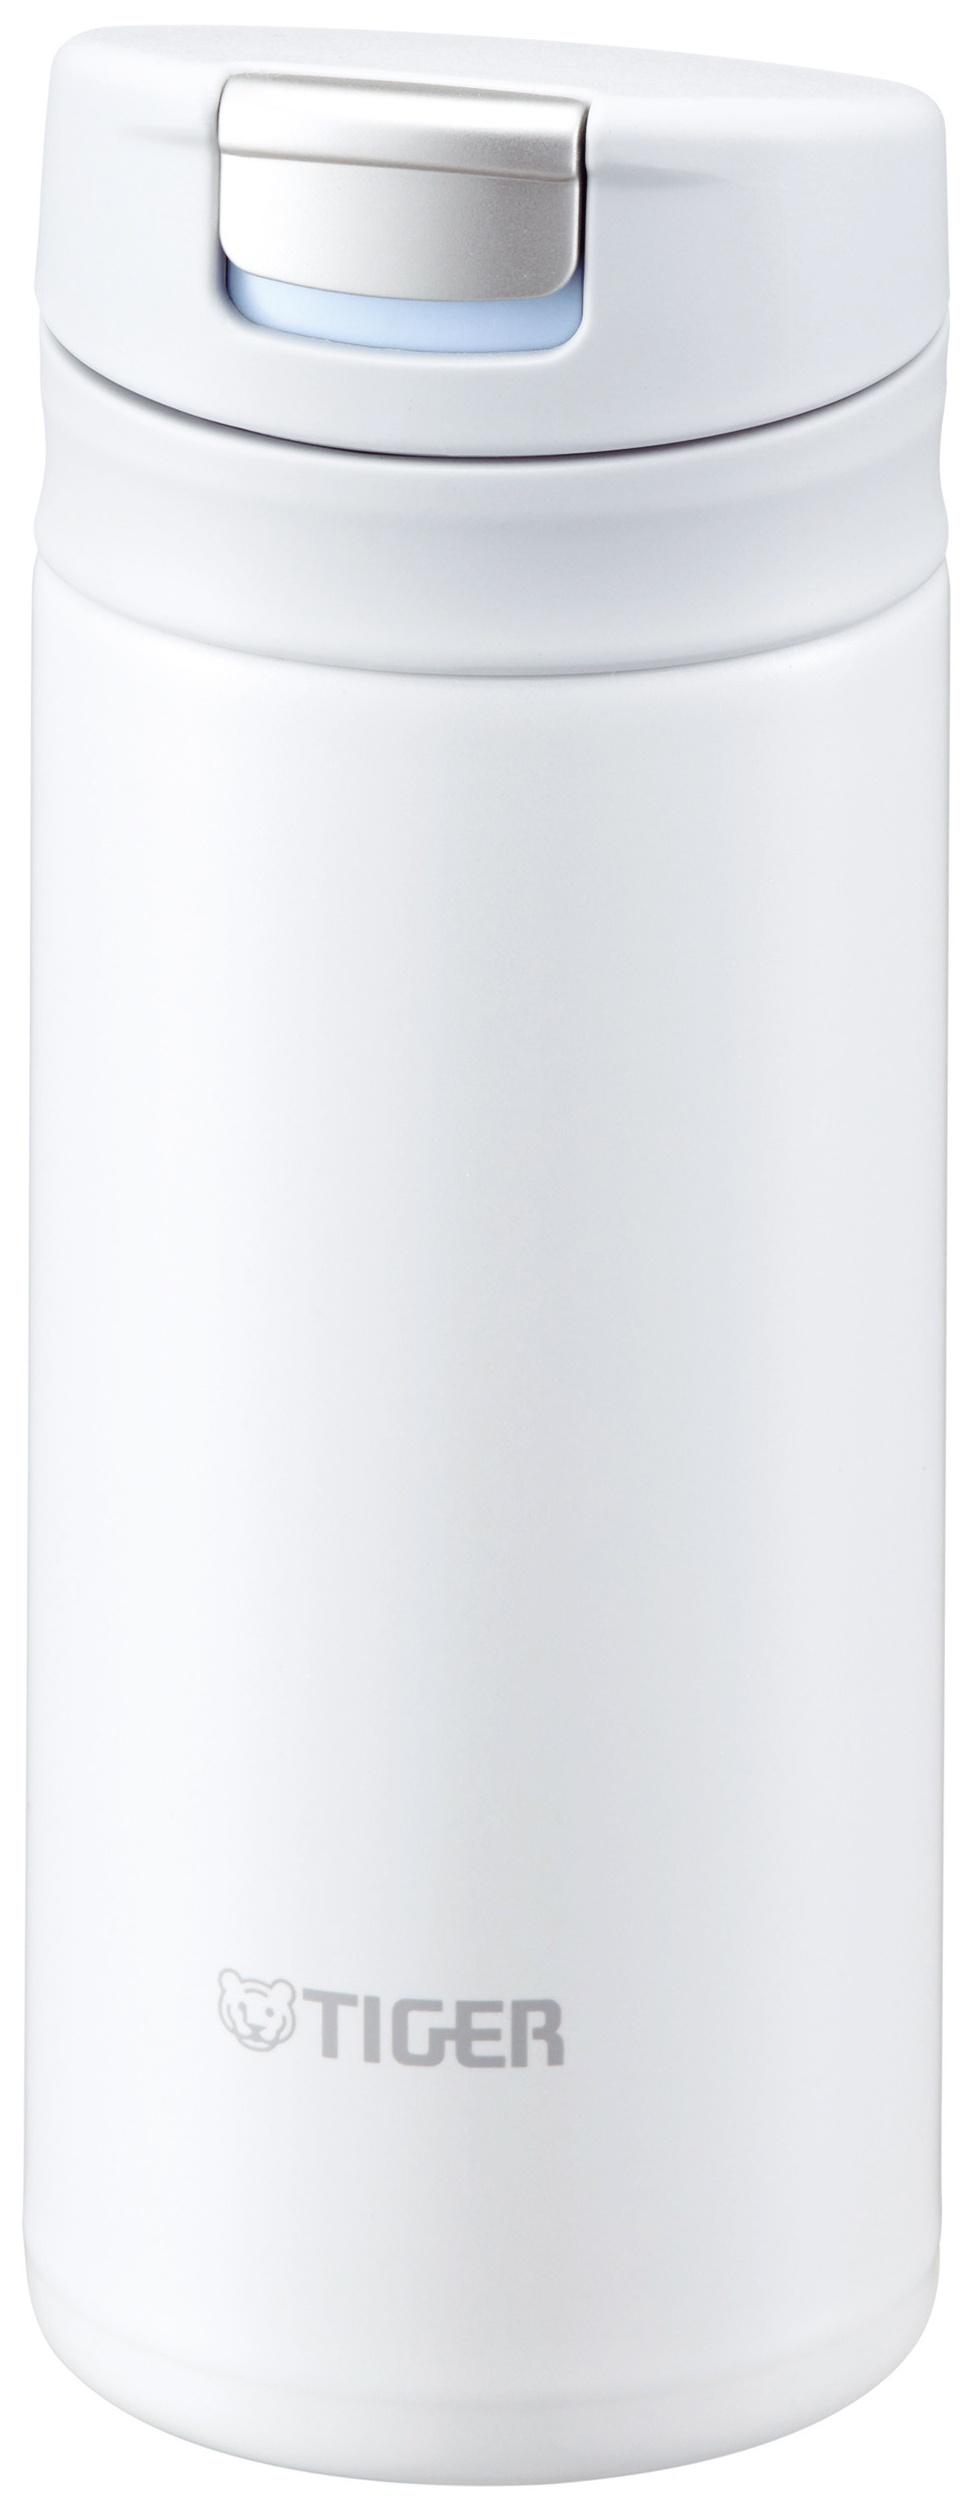 Термокружка Tiger MMX-A020 WW, белый, 200 мл